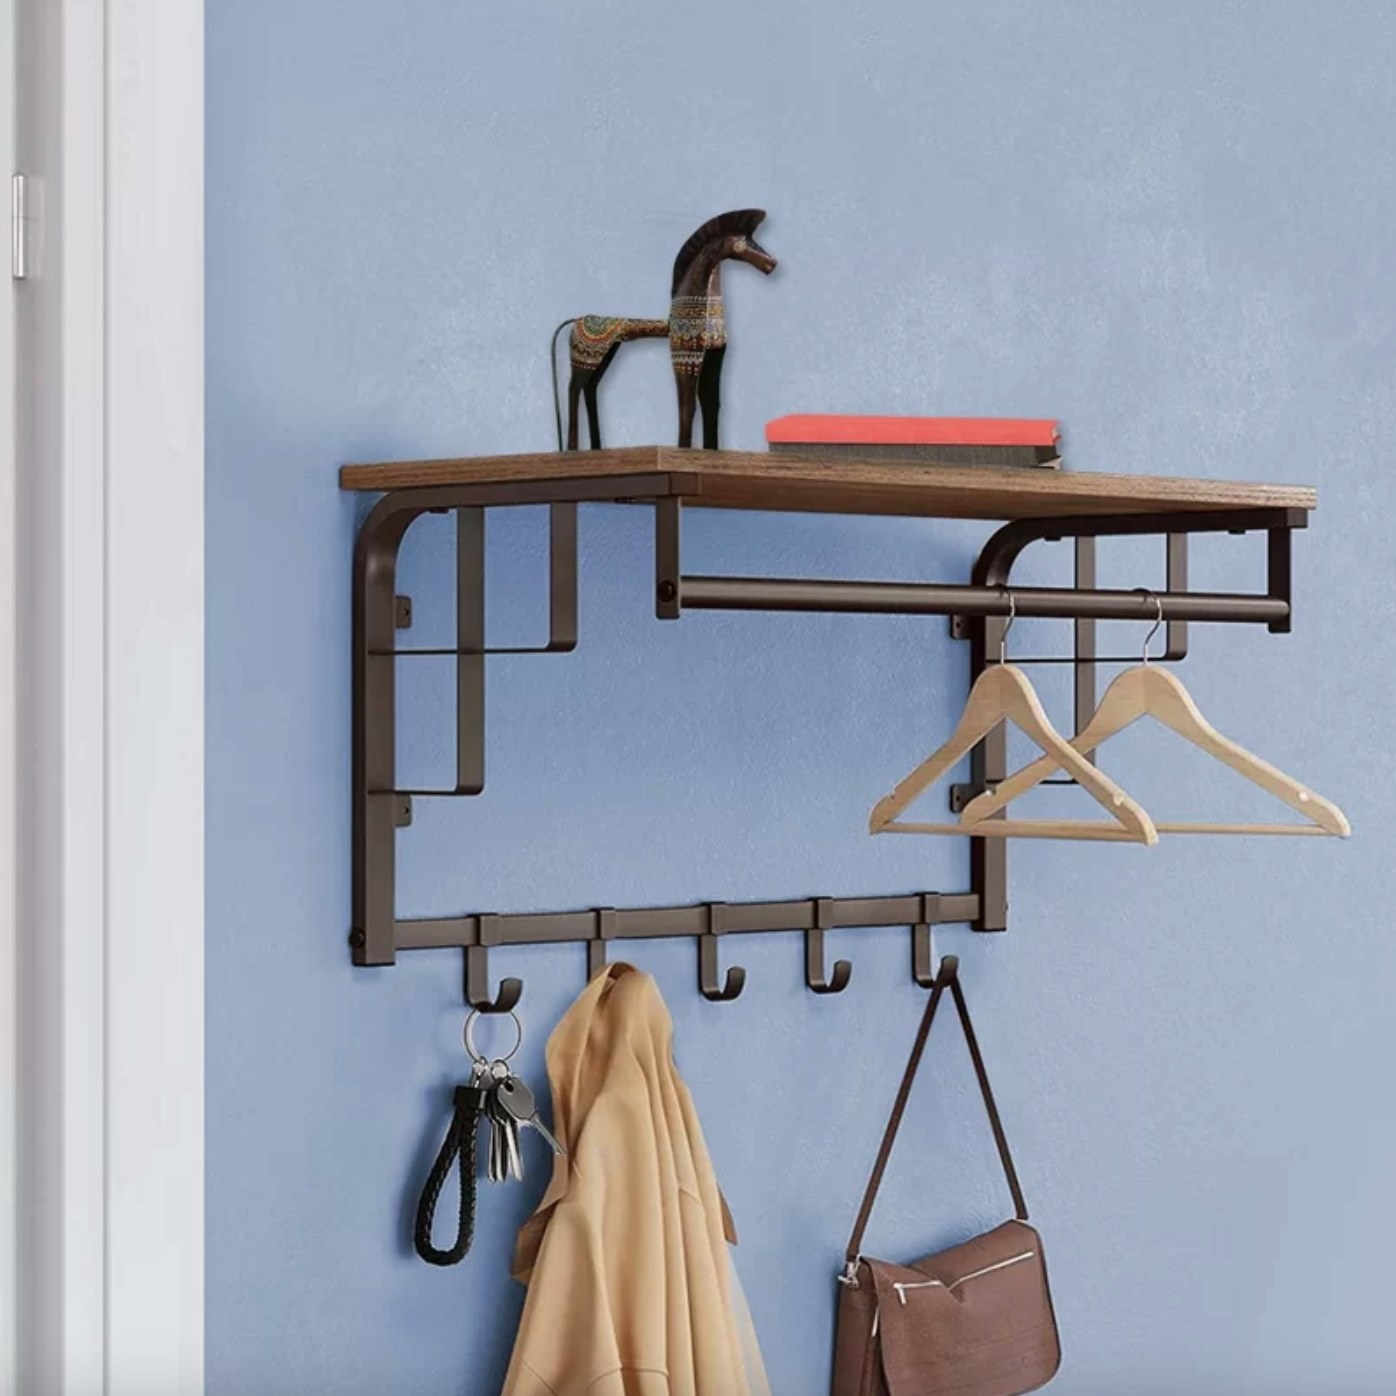 The coat rack